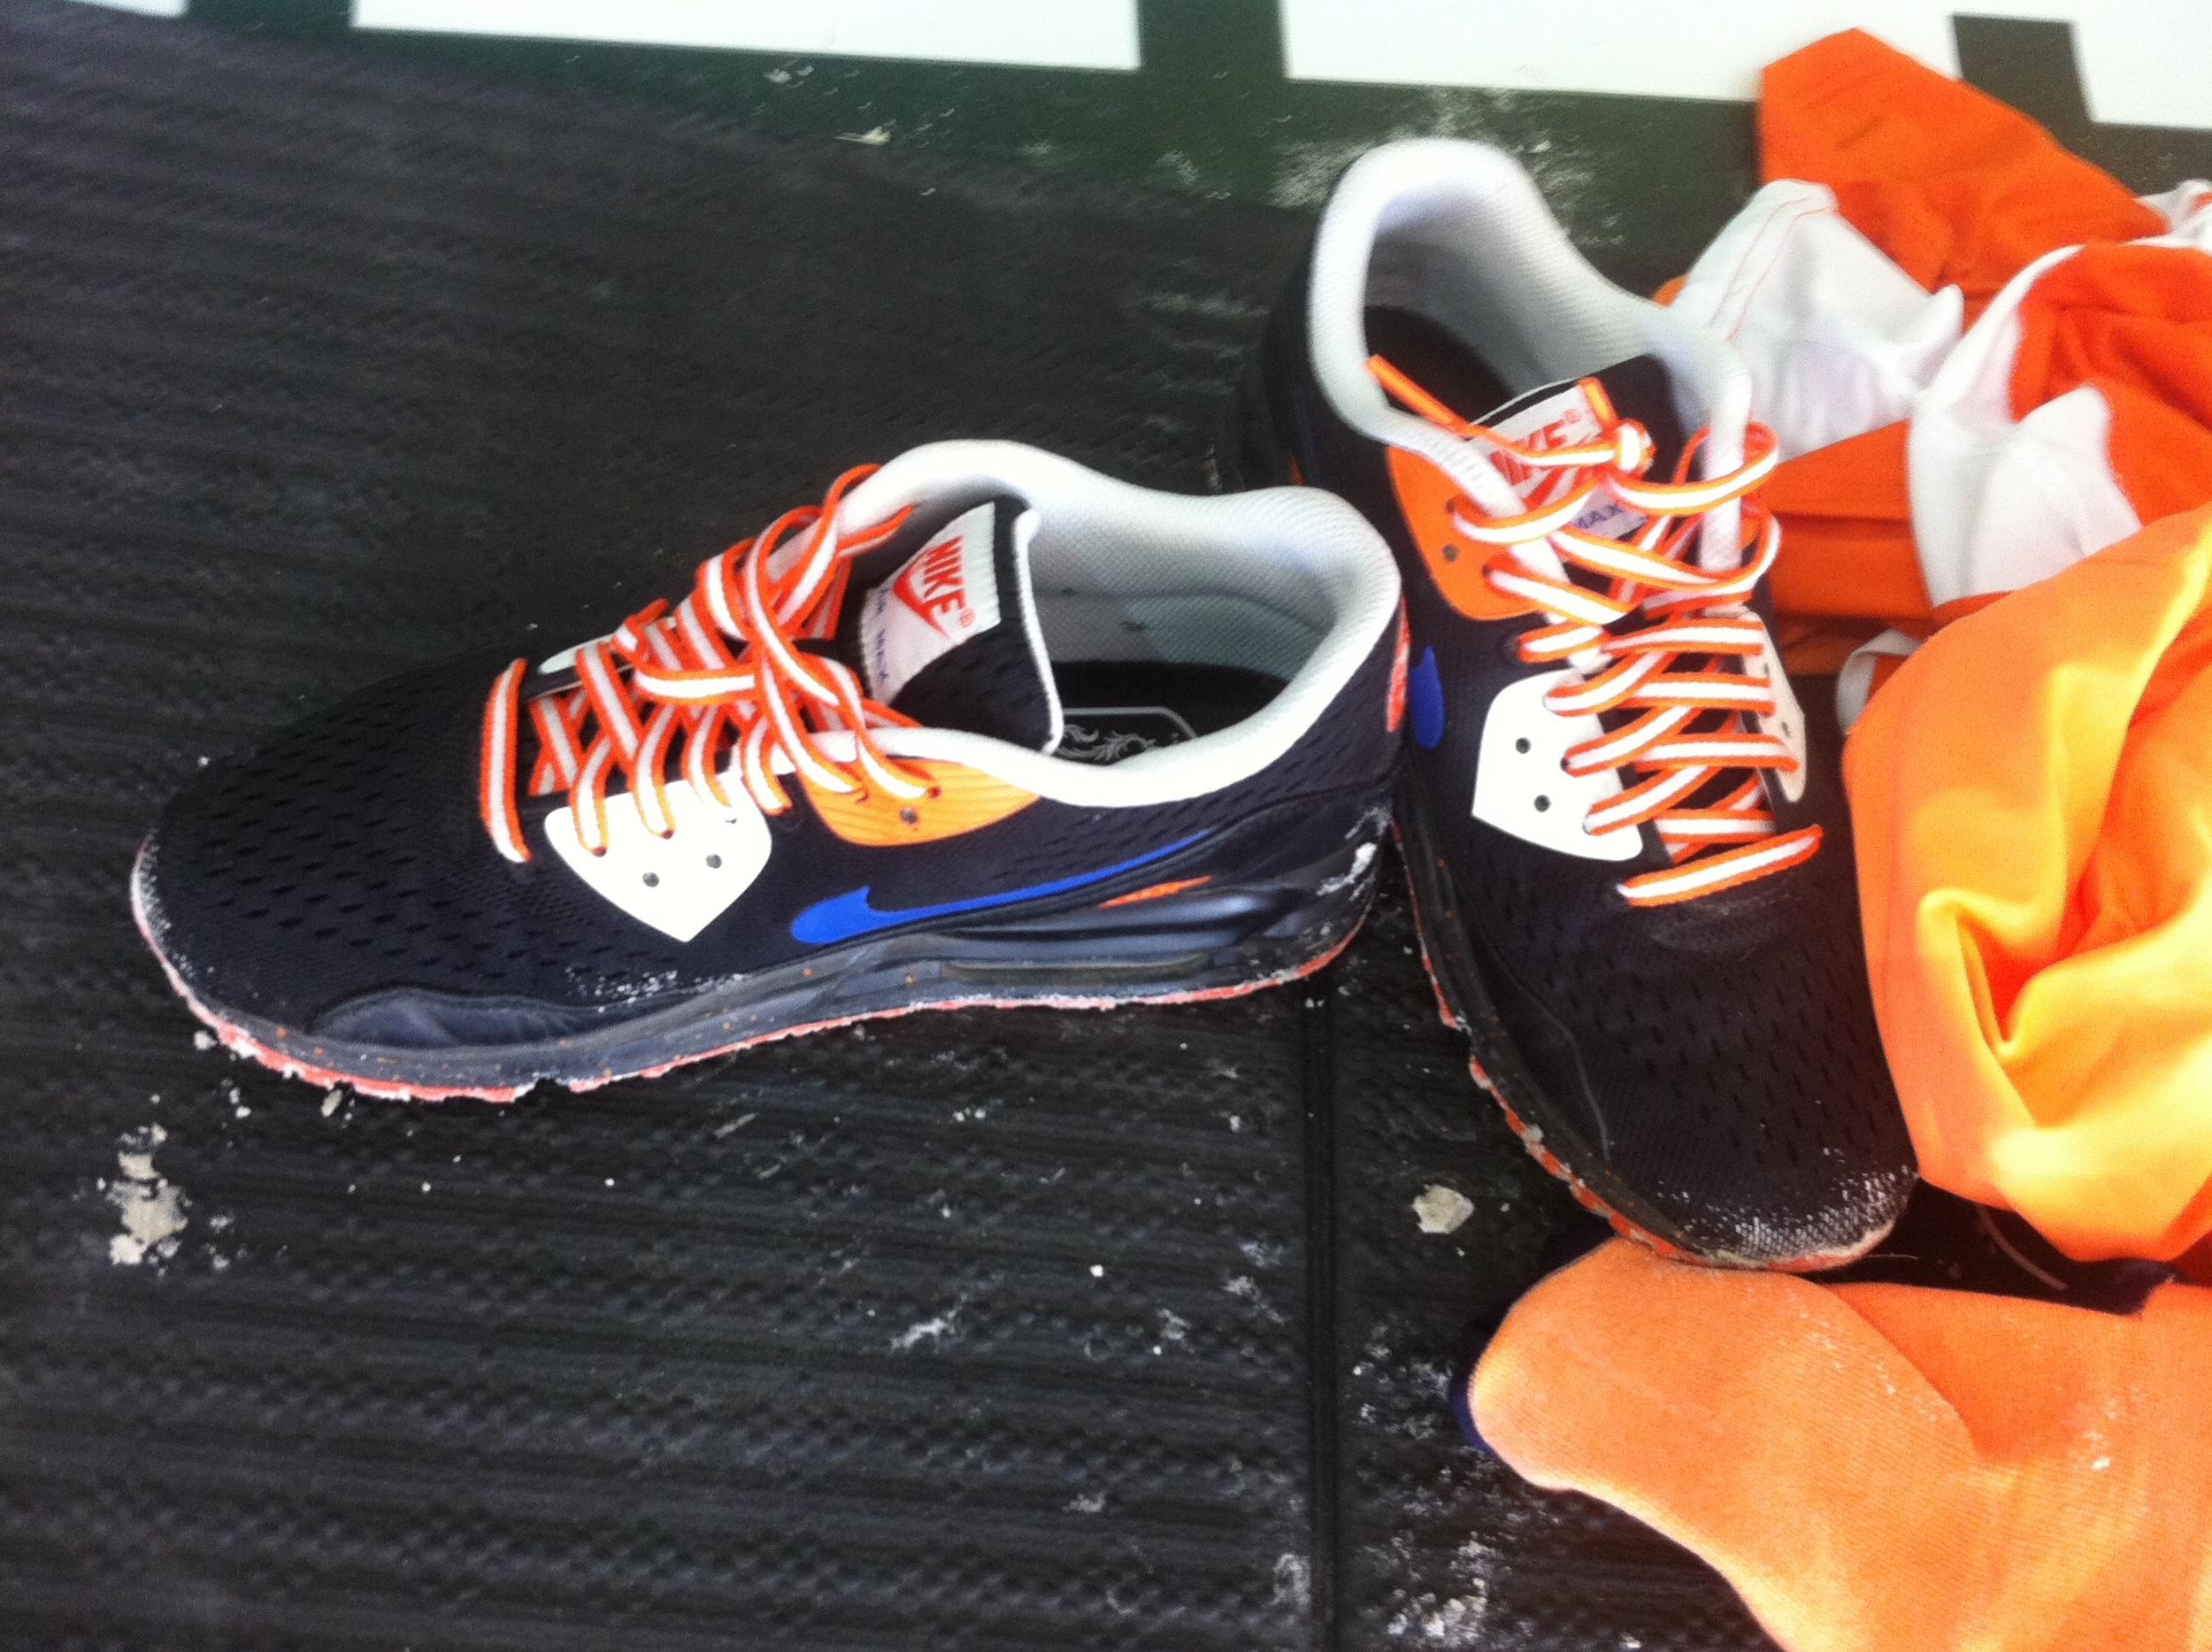 Limited Edition: Dutch Nikes!